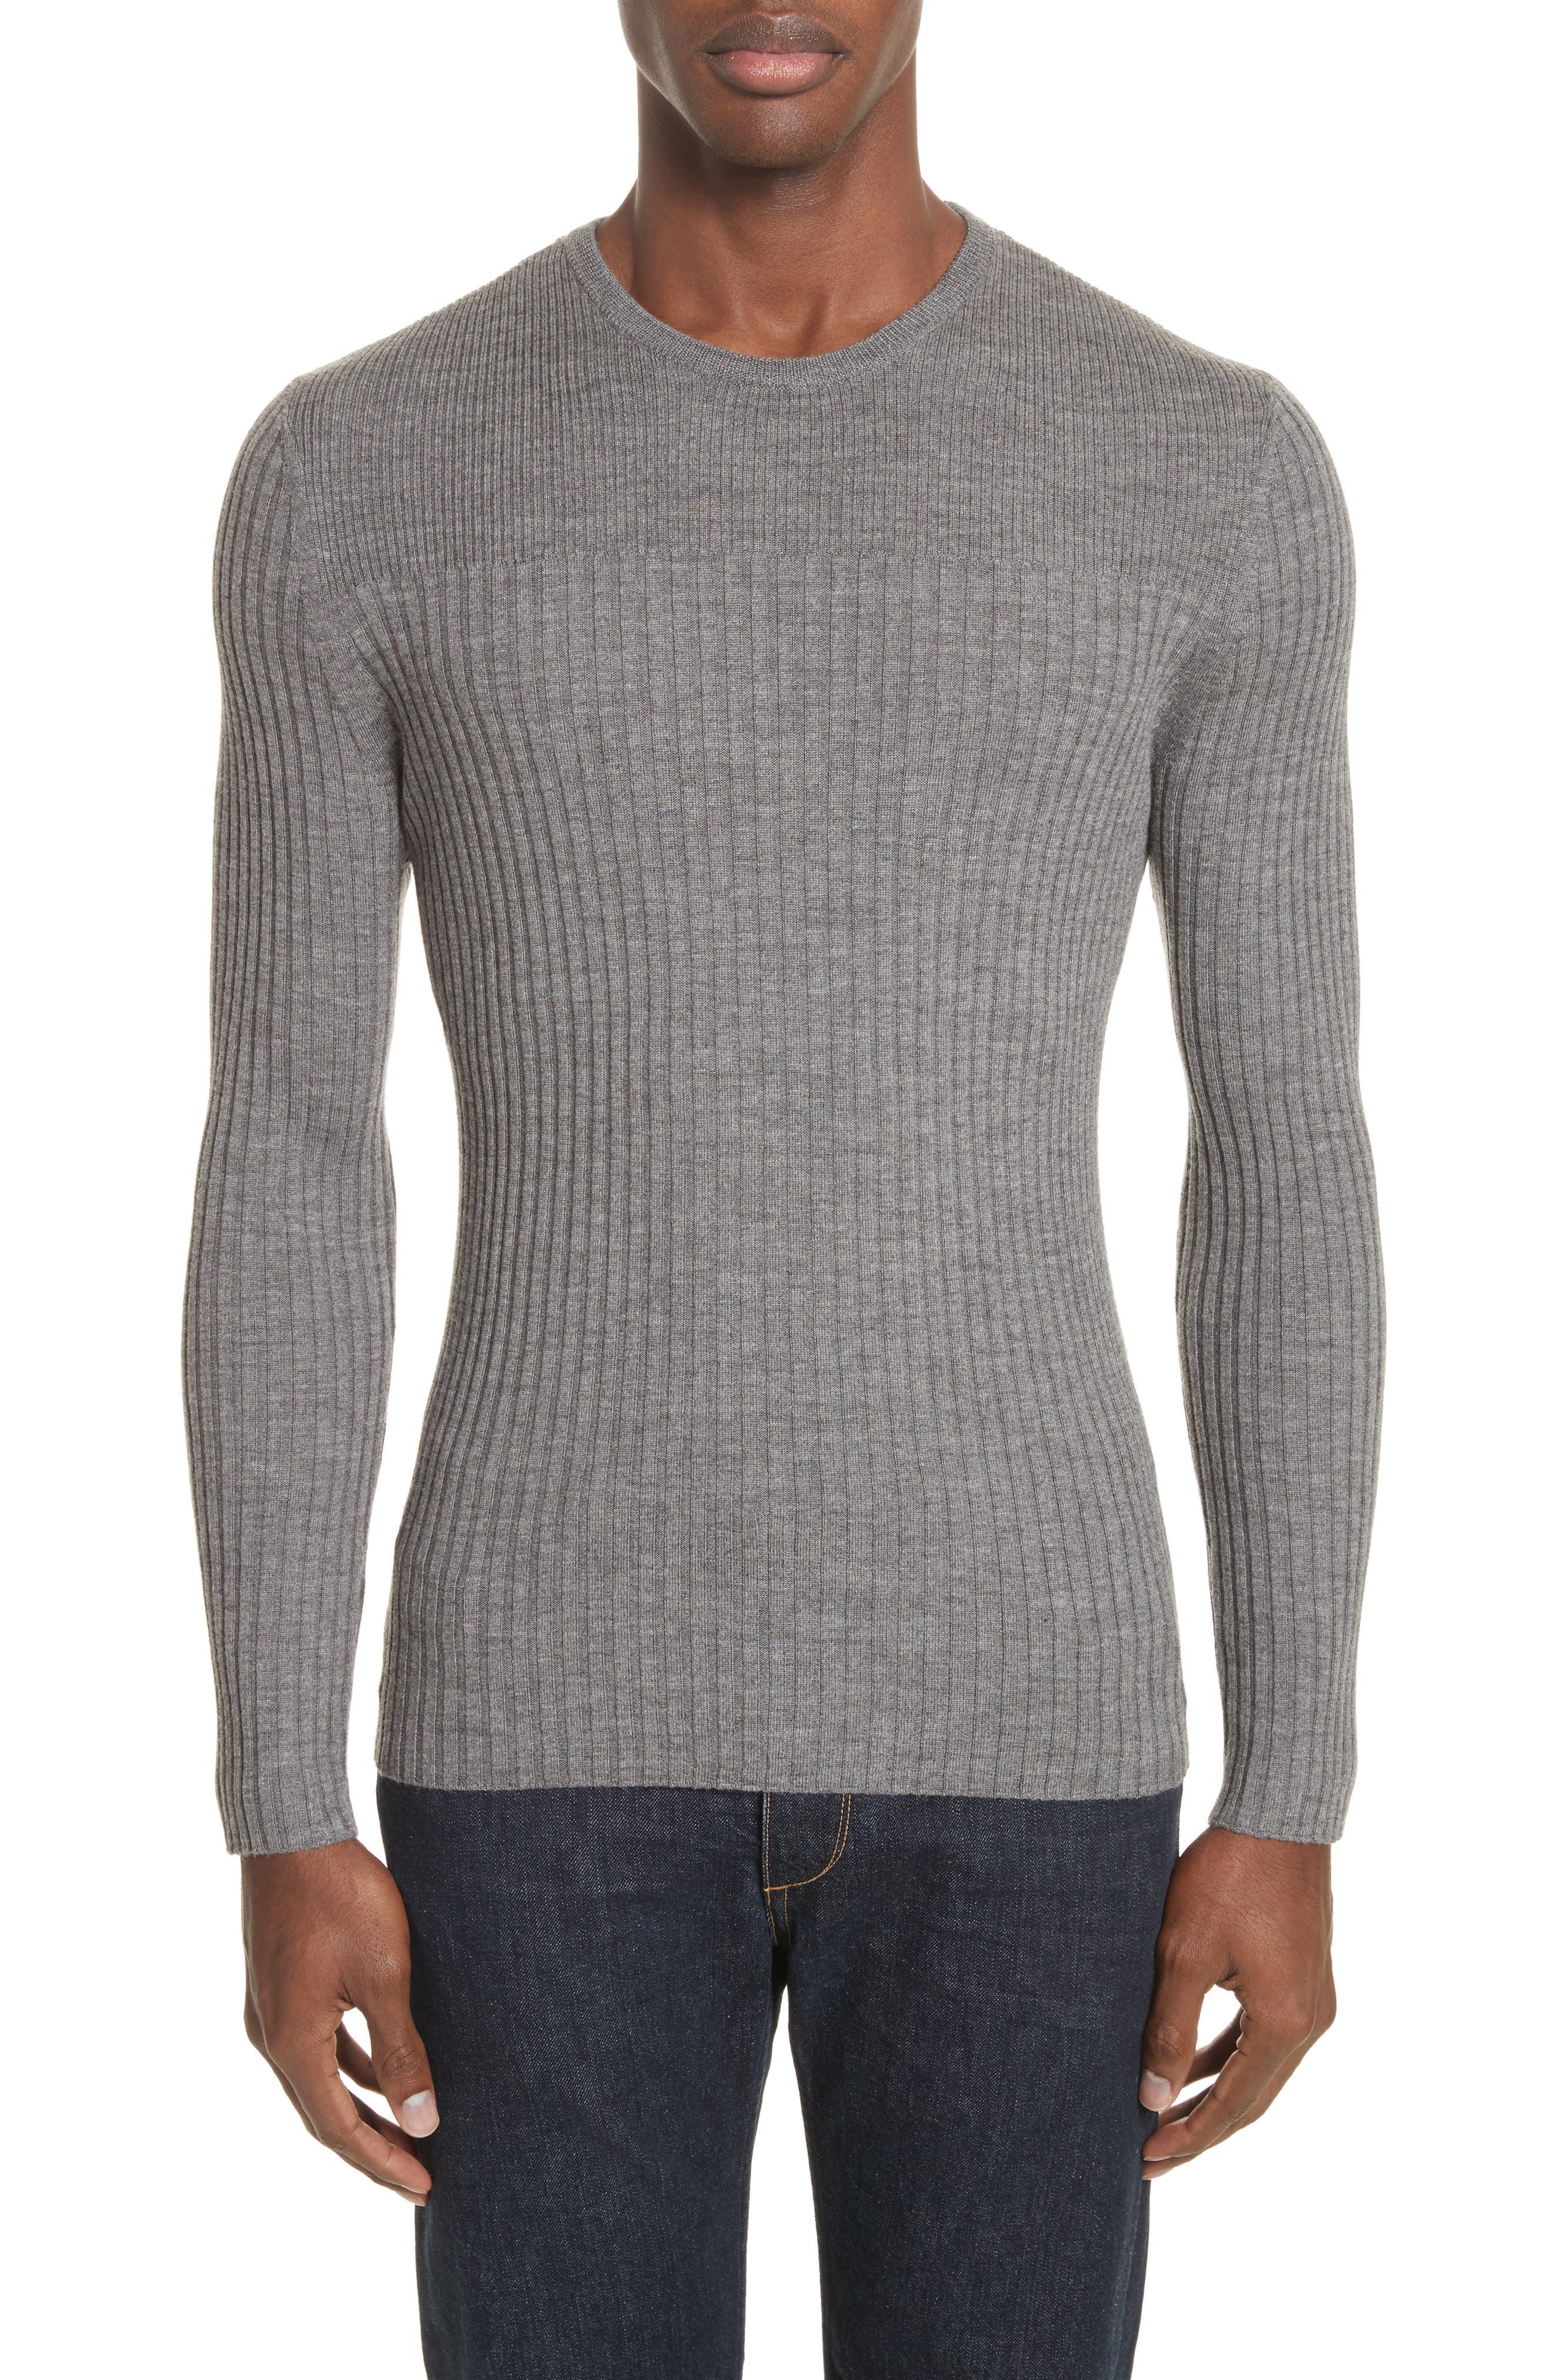 Alternate Image 1 Selected - ATM Anthony Thomas Melillo Merino Wool Sweater